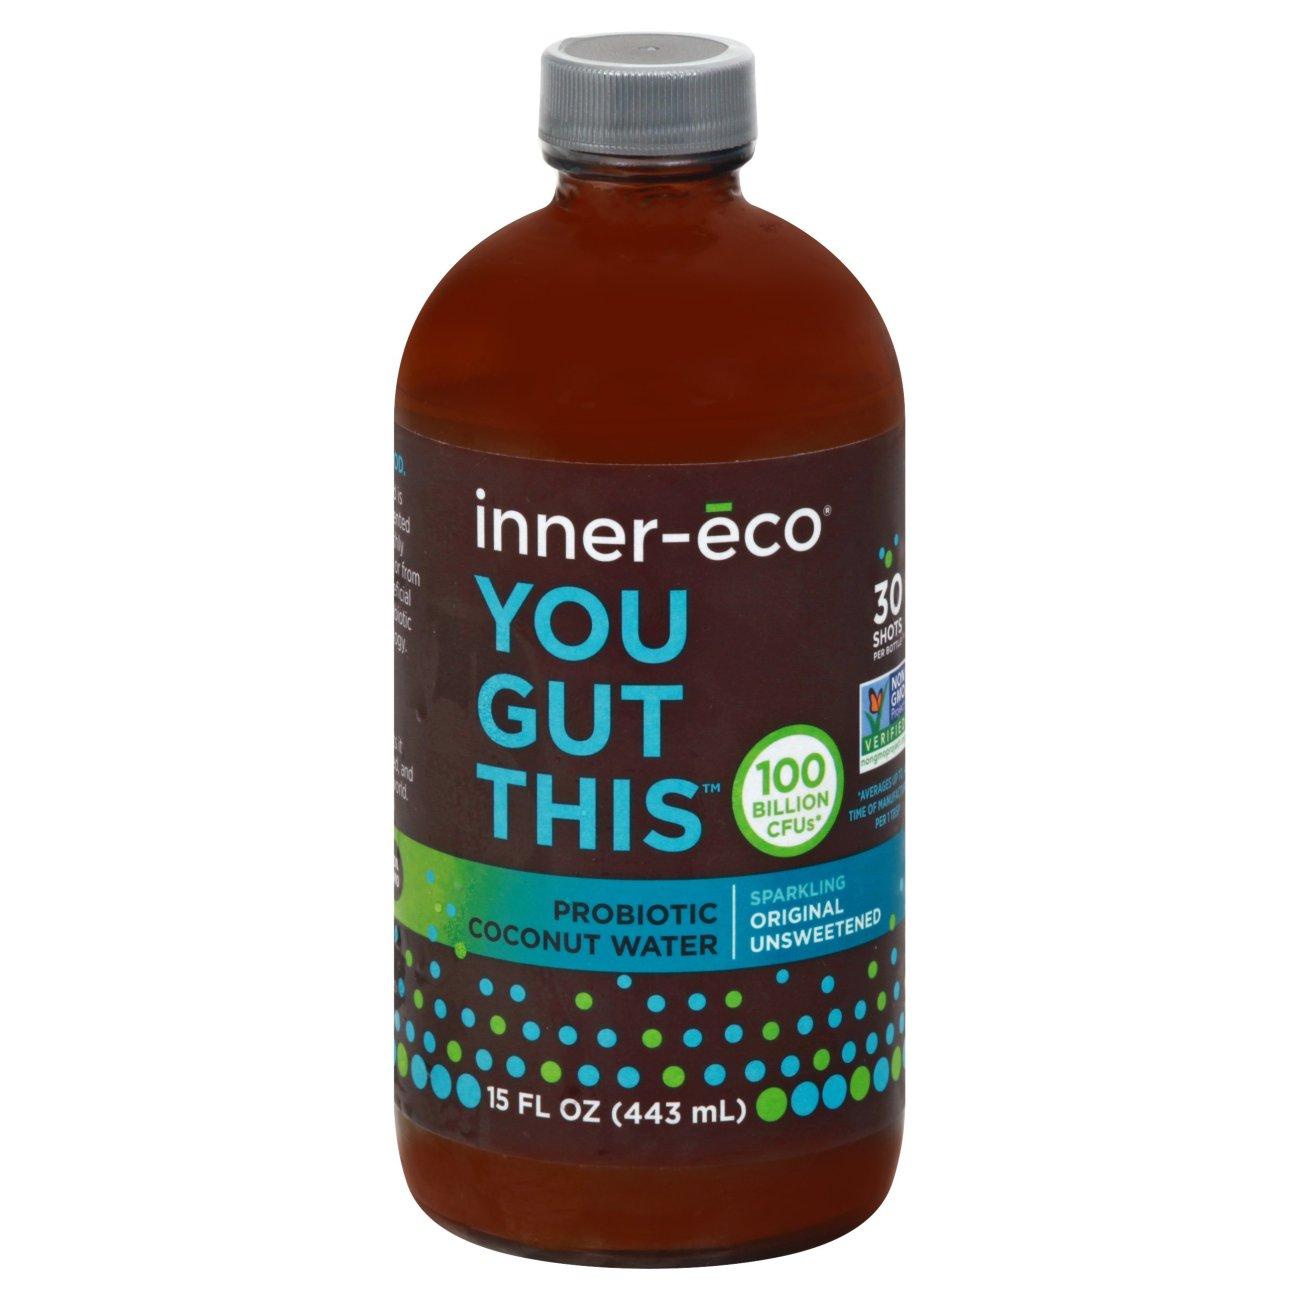 Inner Eco Original Dairy-Free Probiotic Kefir - Shop Probiotics at HEB